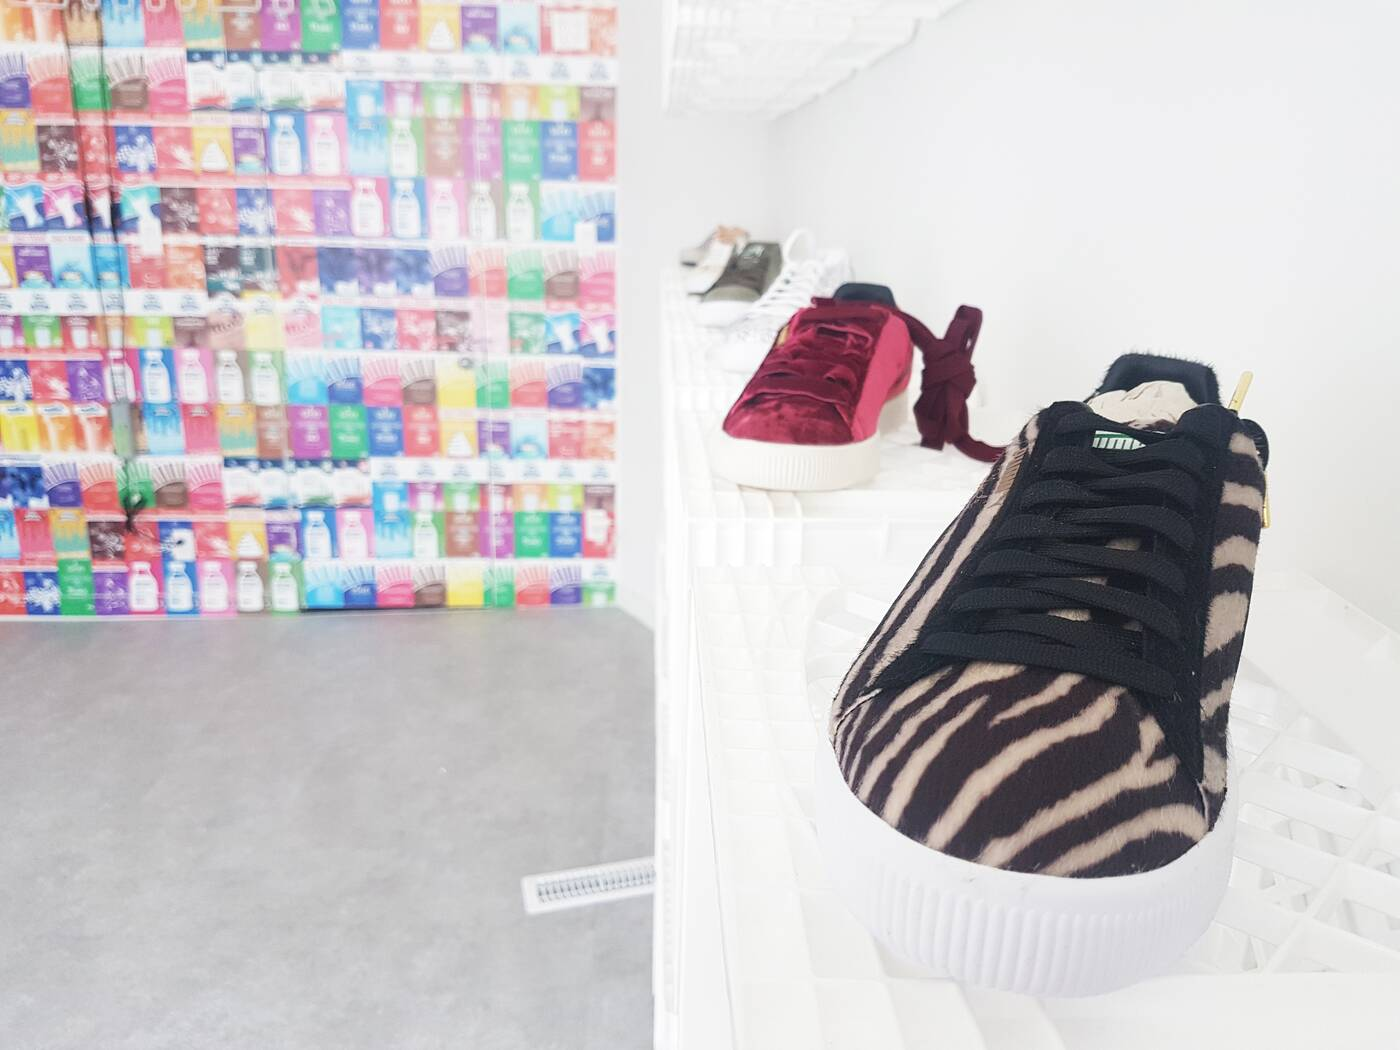 milk sneakers toronto